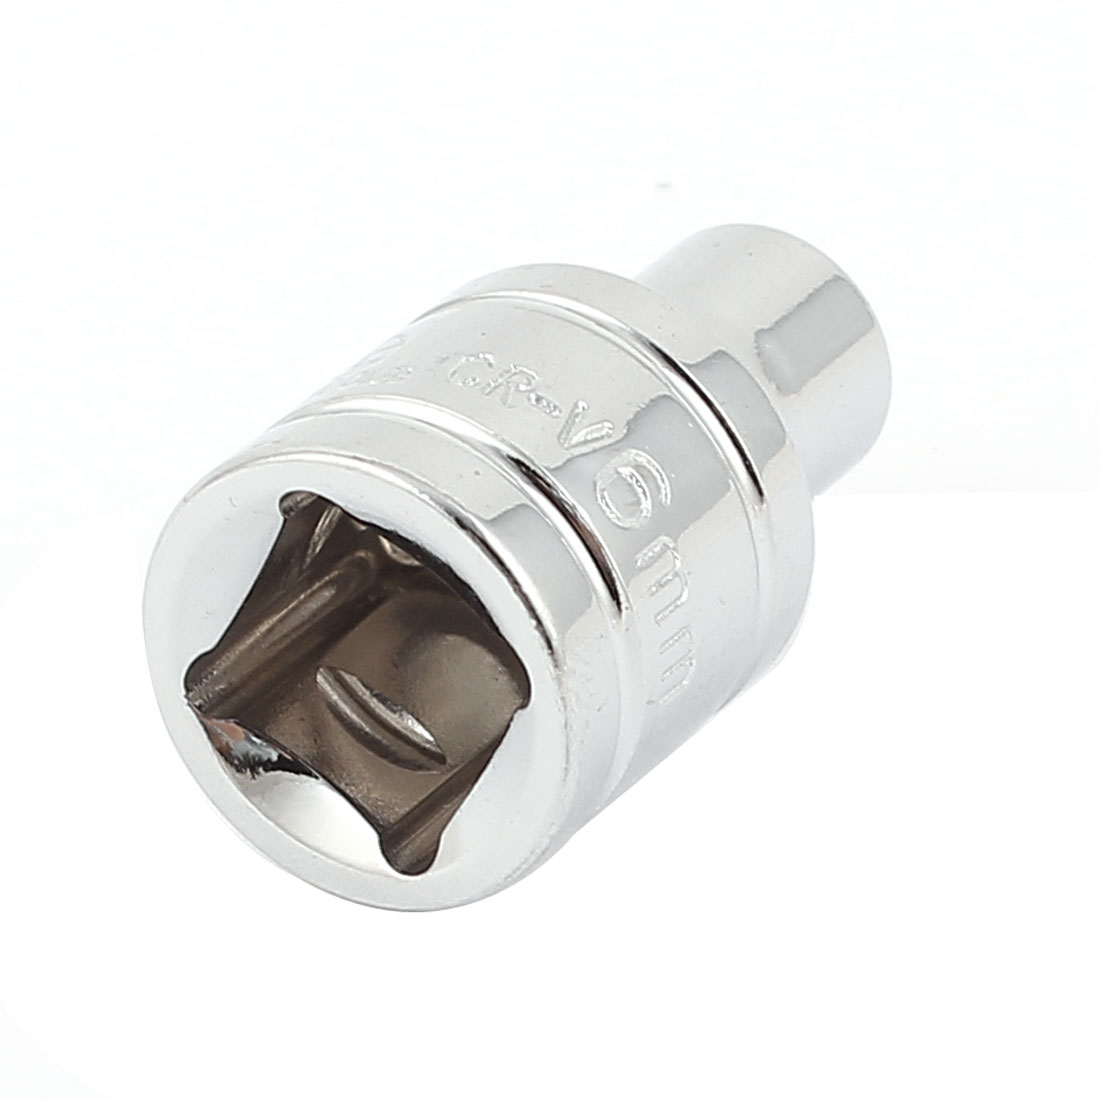 "3/8"" Drive Chrome-vanadium Steel Metric 6 Point Axle Nut Hex Socket 6mm"